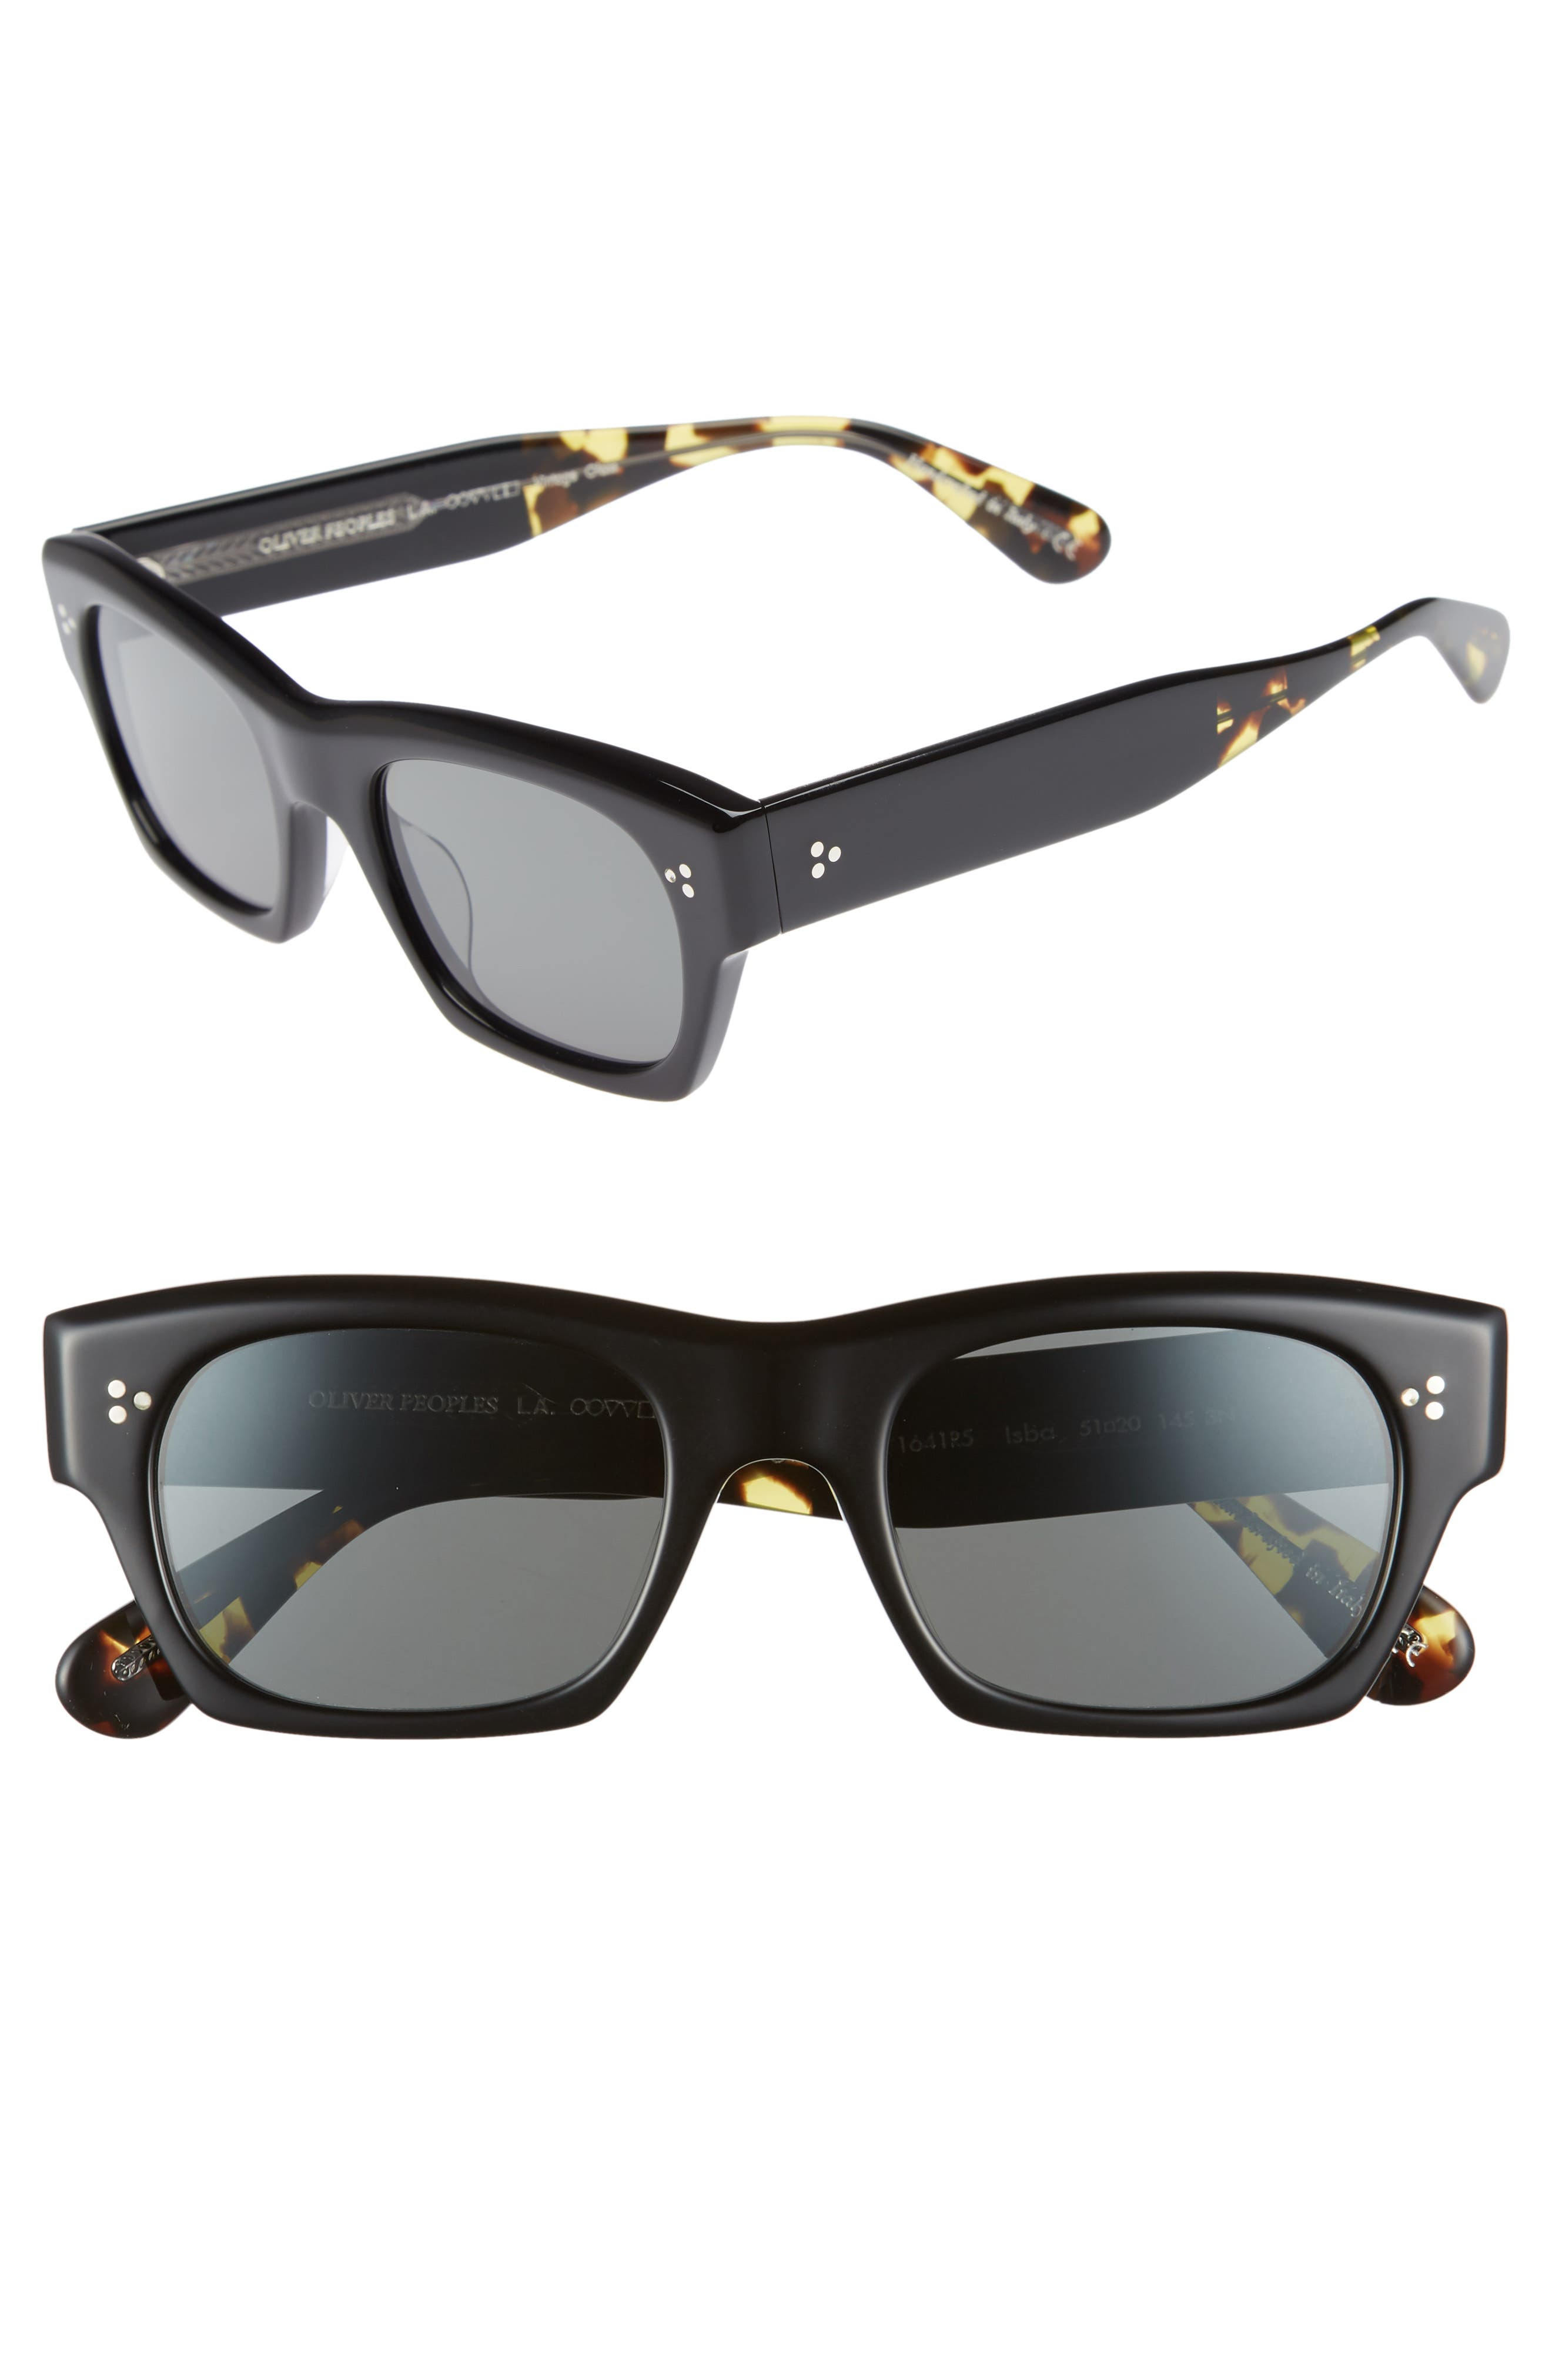 Isba 51mm Sunglasses,                             Main thumbnail 1, color,                             BLACK